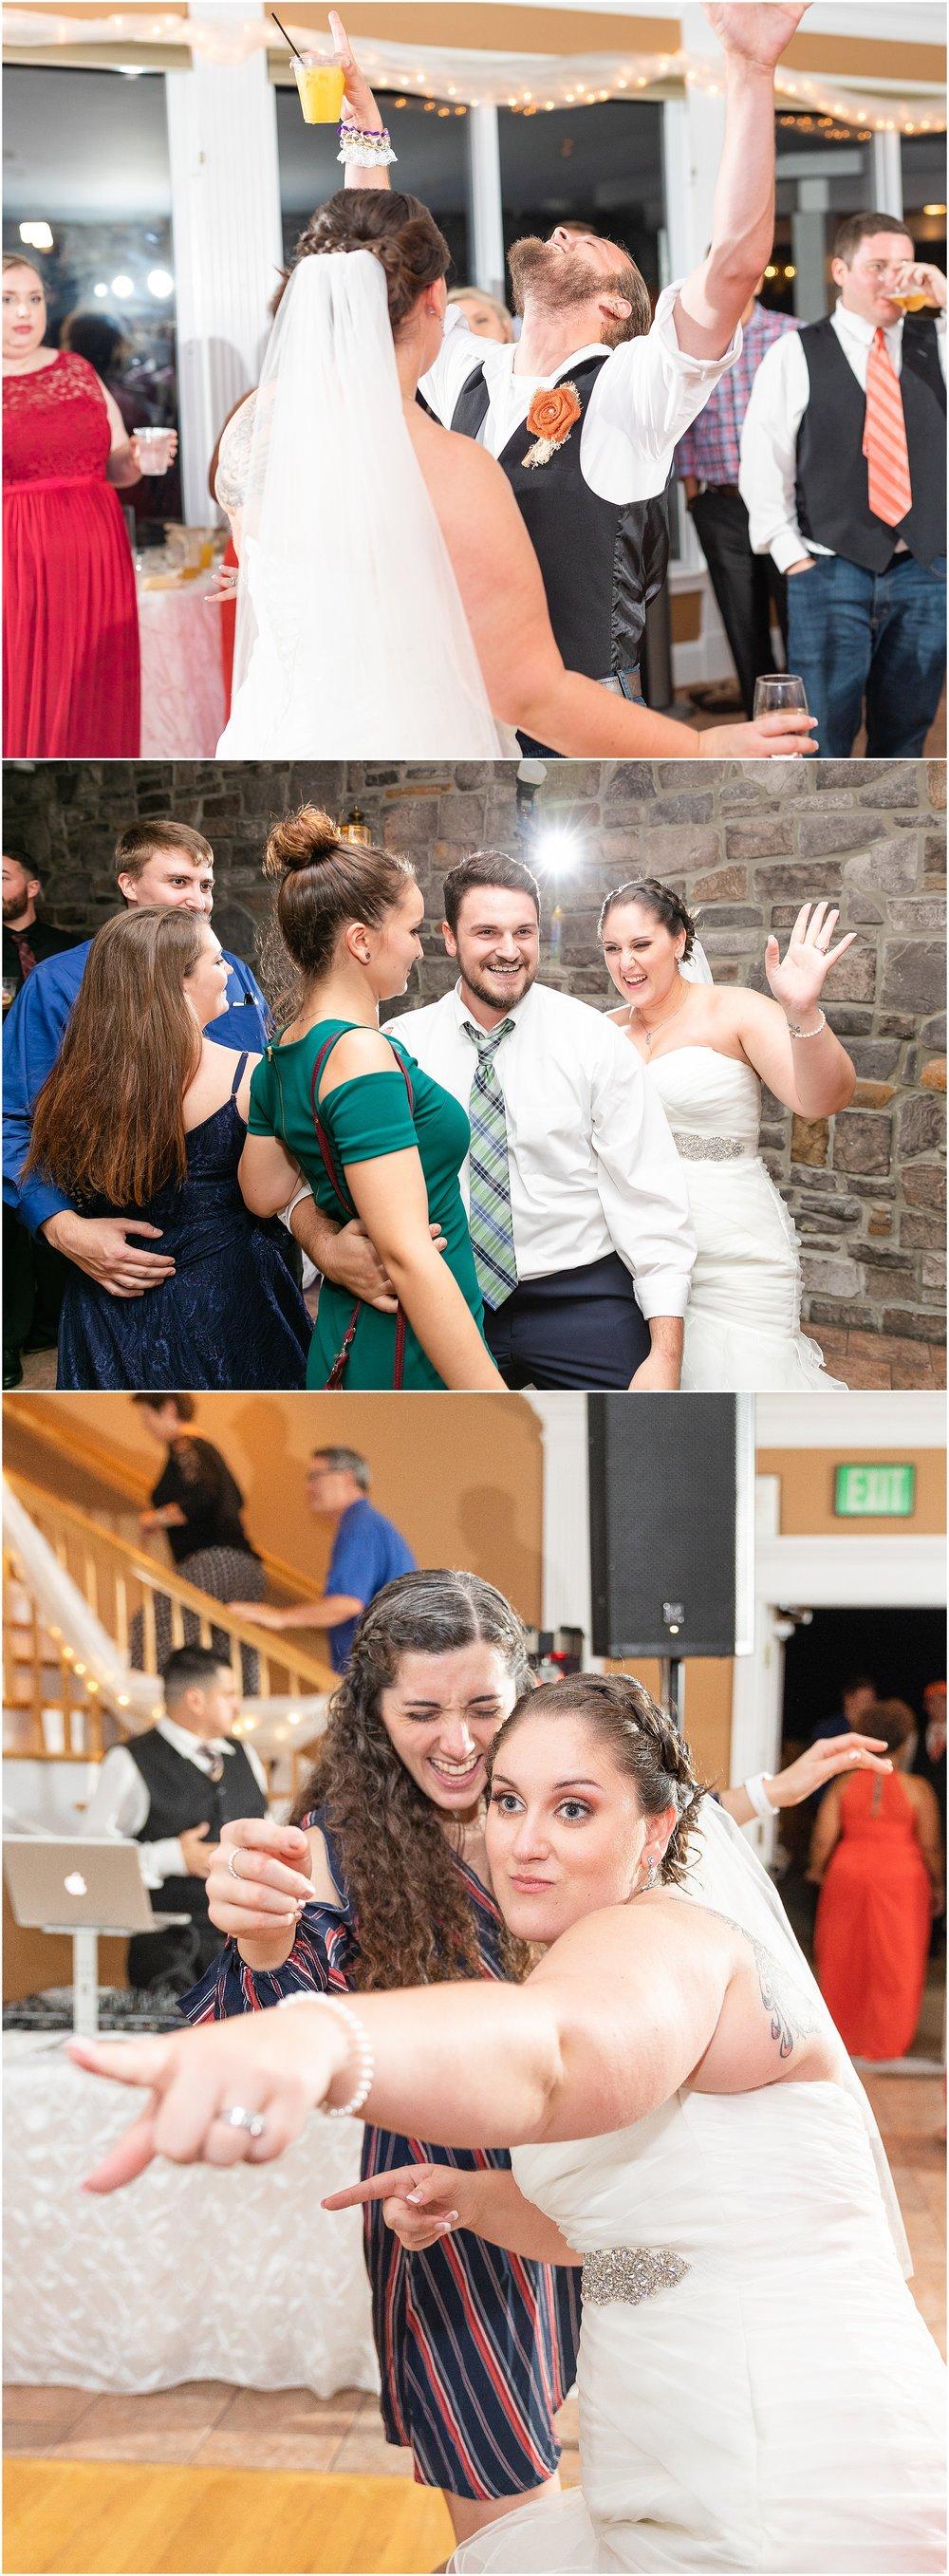 Morningside-inn-wedding-photos_0237.jpg